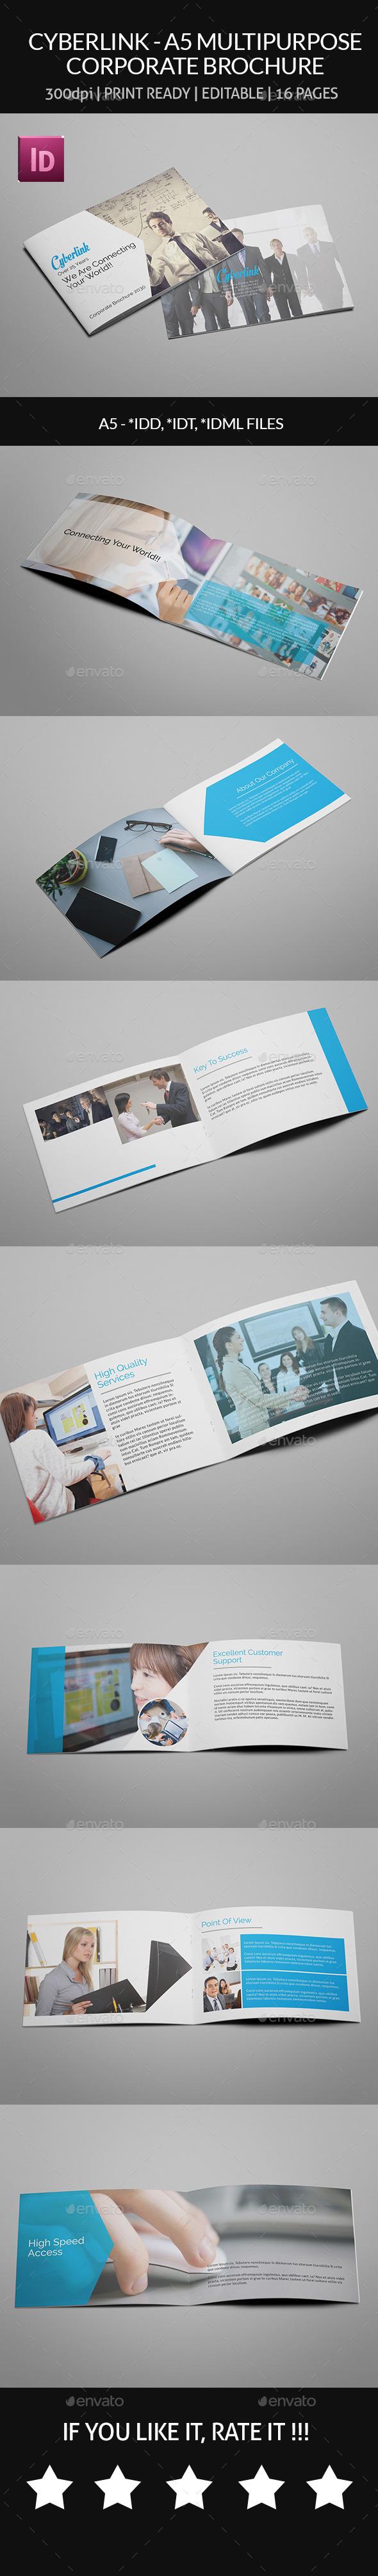 GraphicRiver Cyberlink A5 Multipurpose Corporate Brochure 9136323